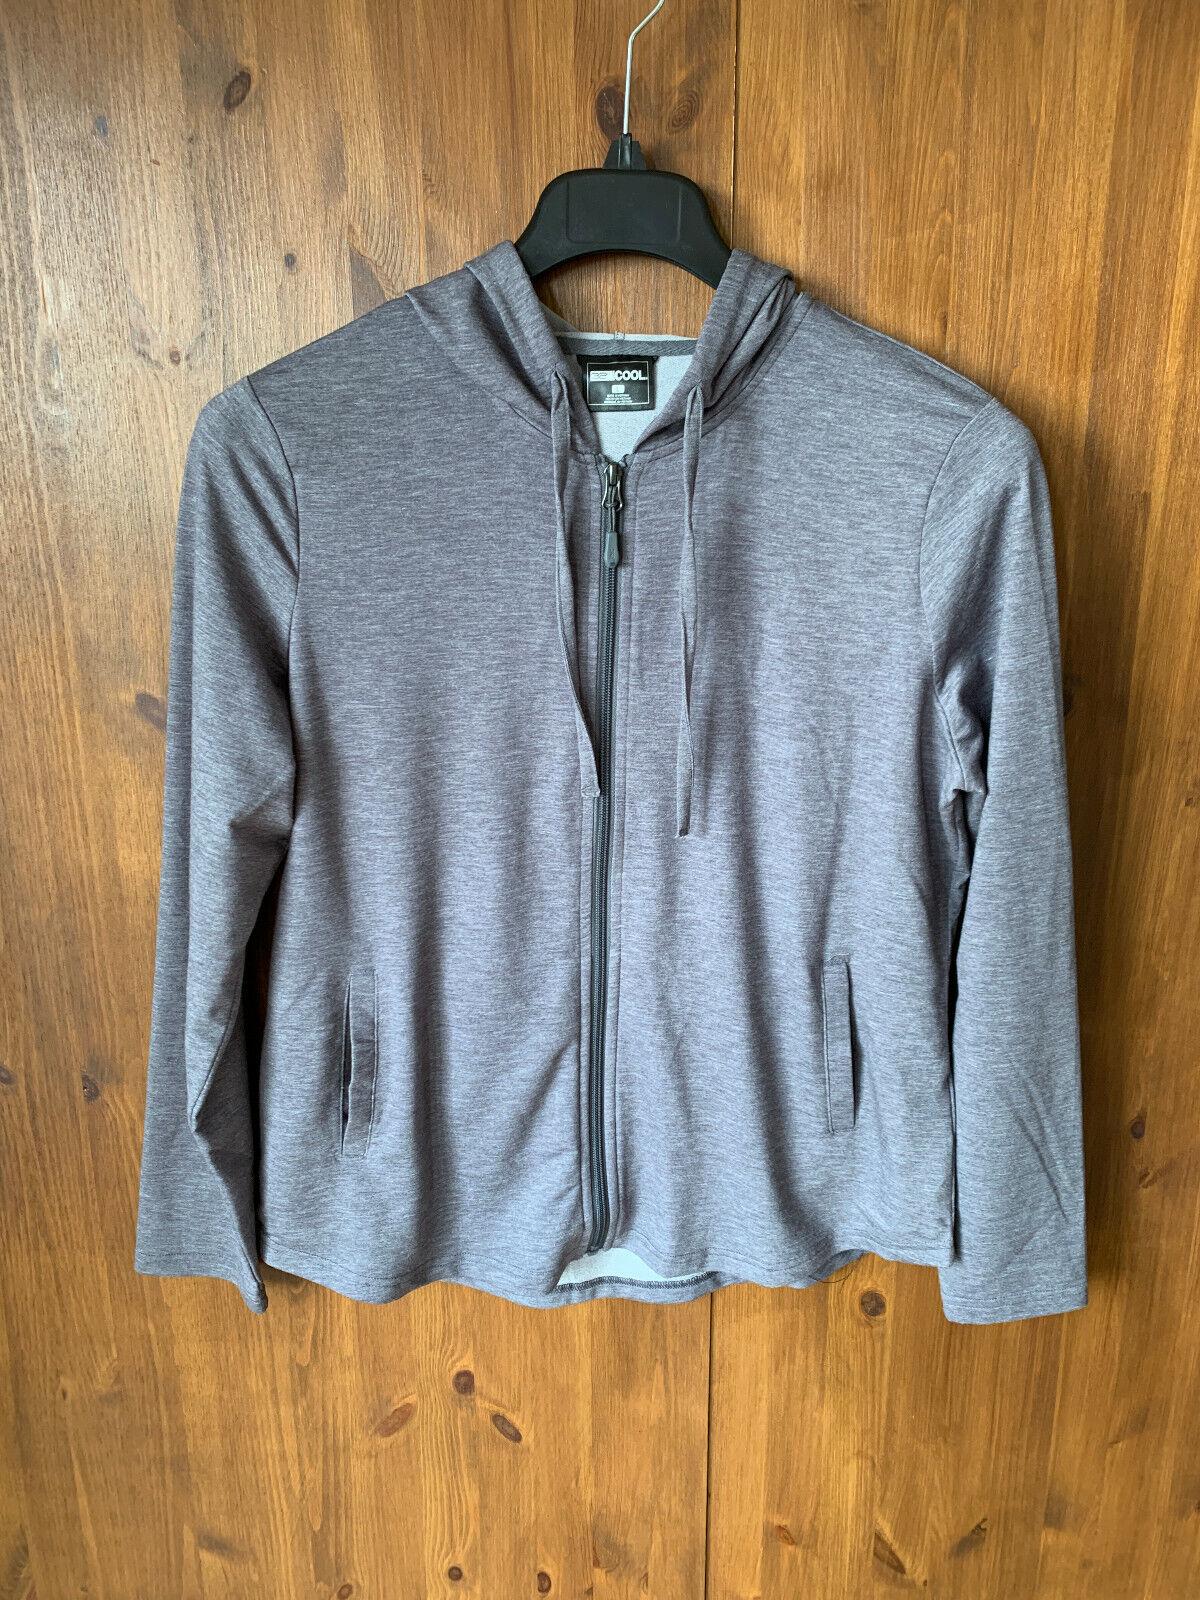 32 DEGREES COOL HOODIE Mens Grey Full Zip Jumper Lightweight LARGE - NEW